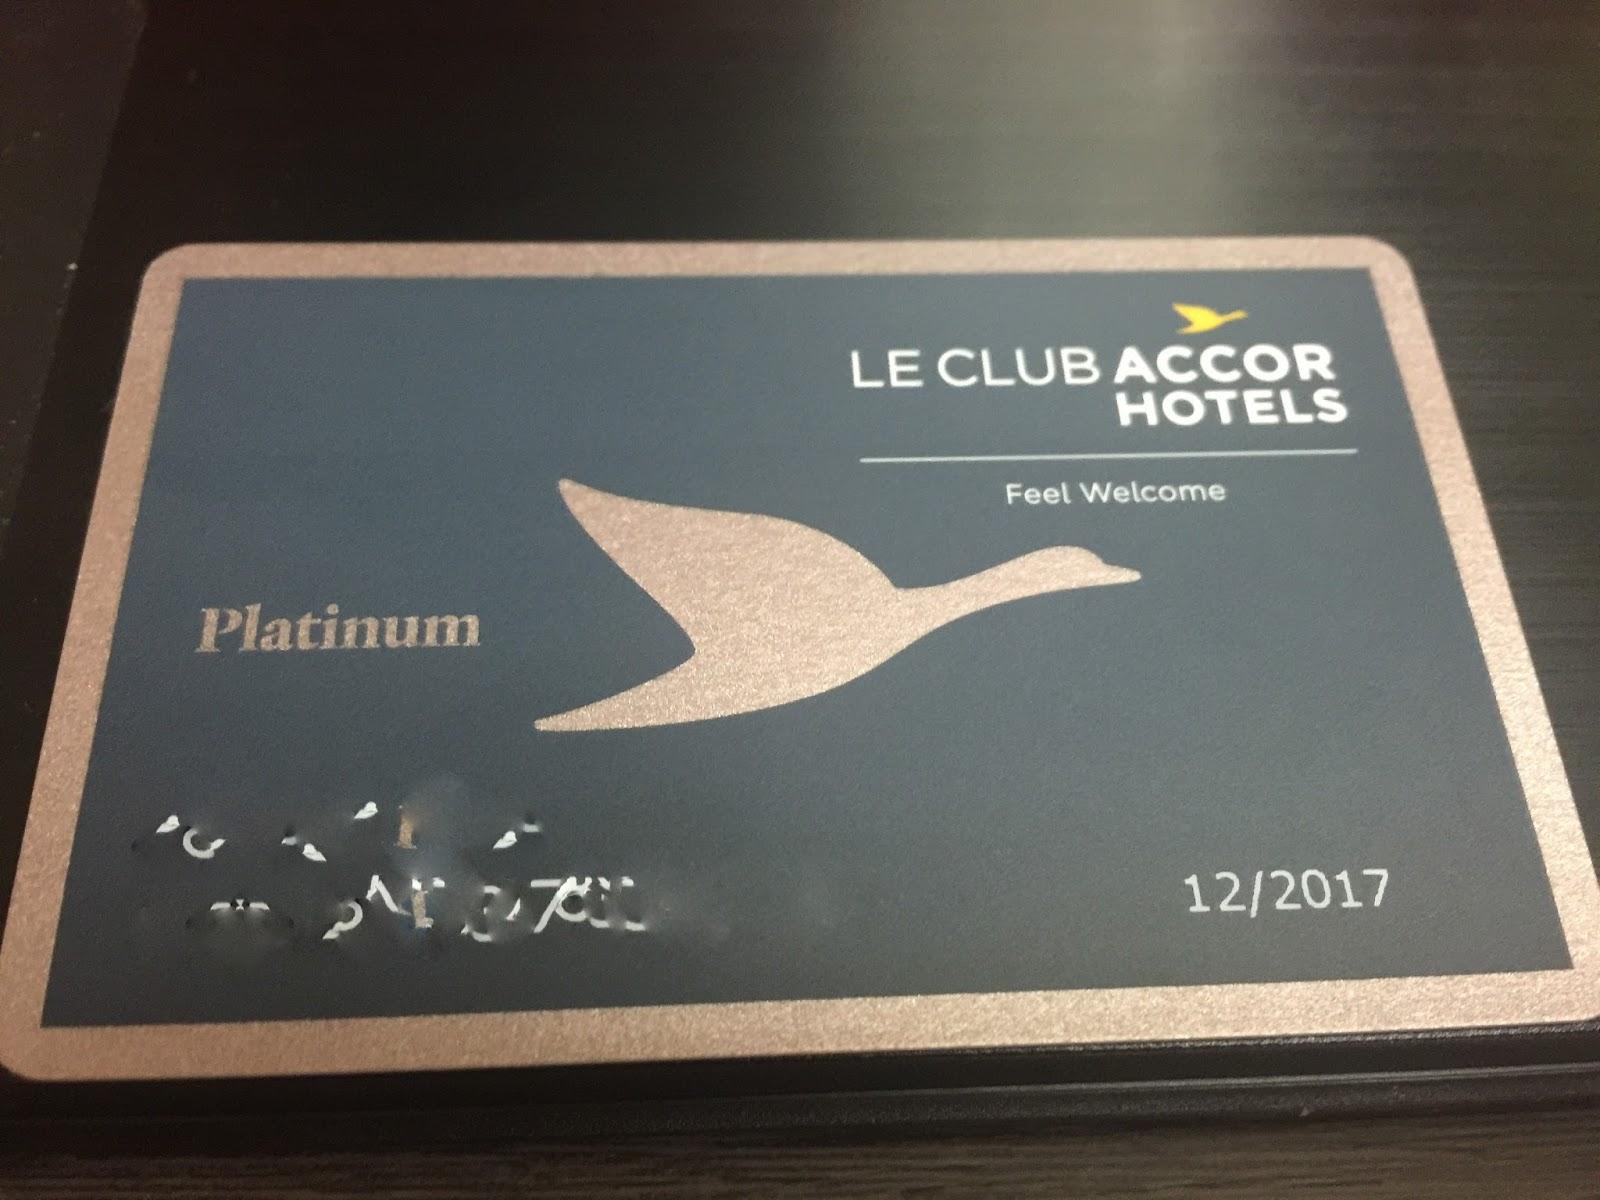 Flying with Justin: 低成本快速升級各大酒店集團高階會員的方法